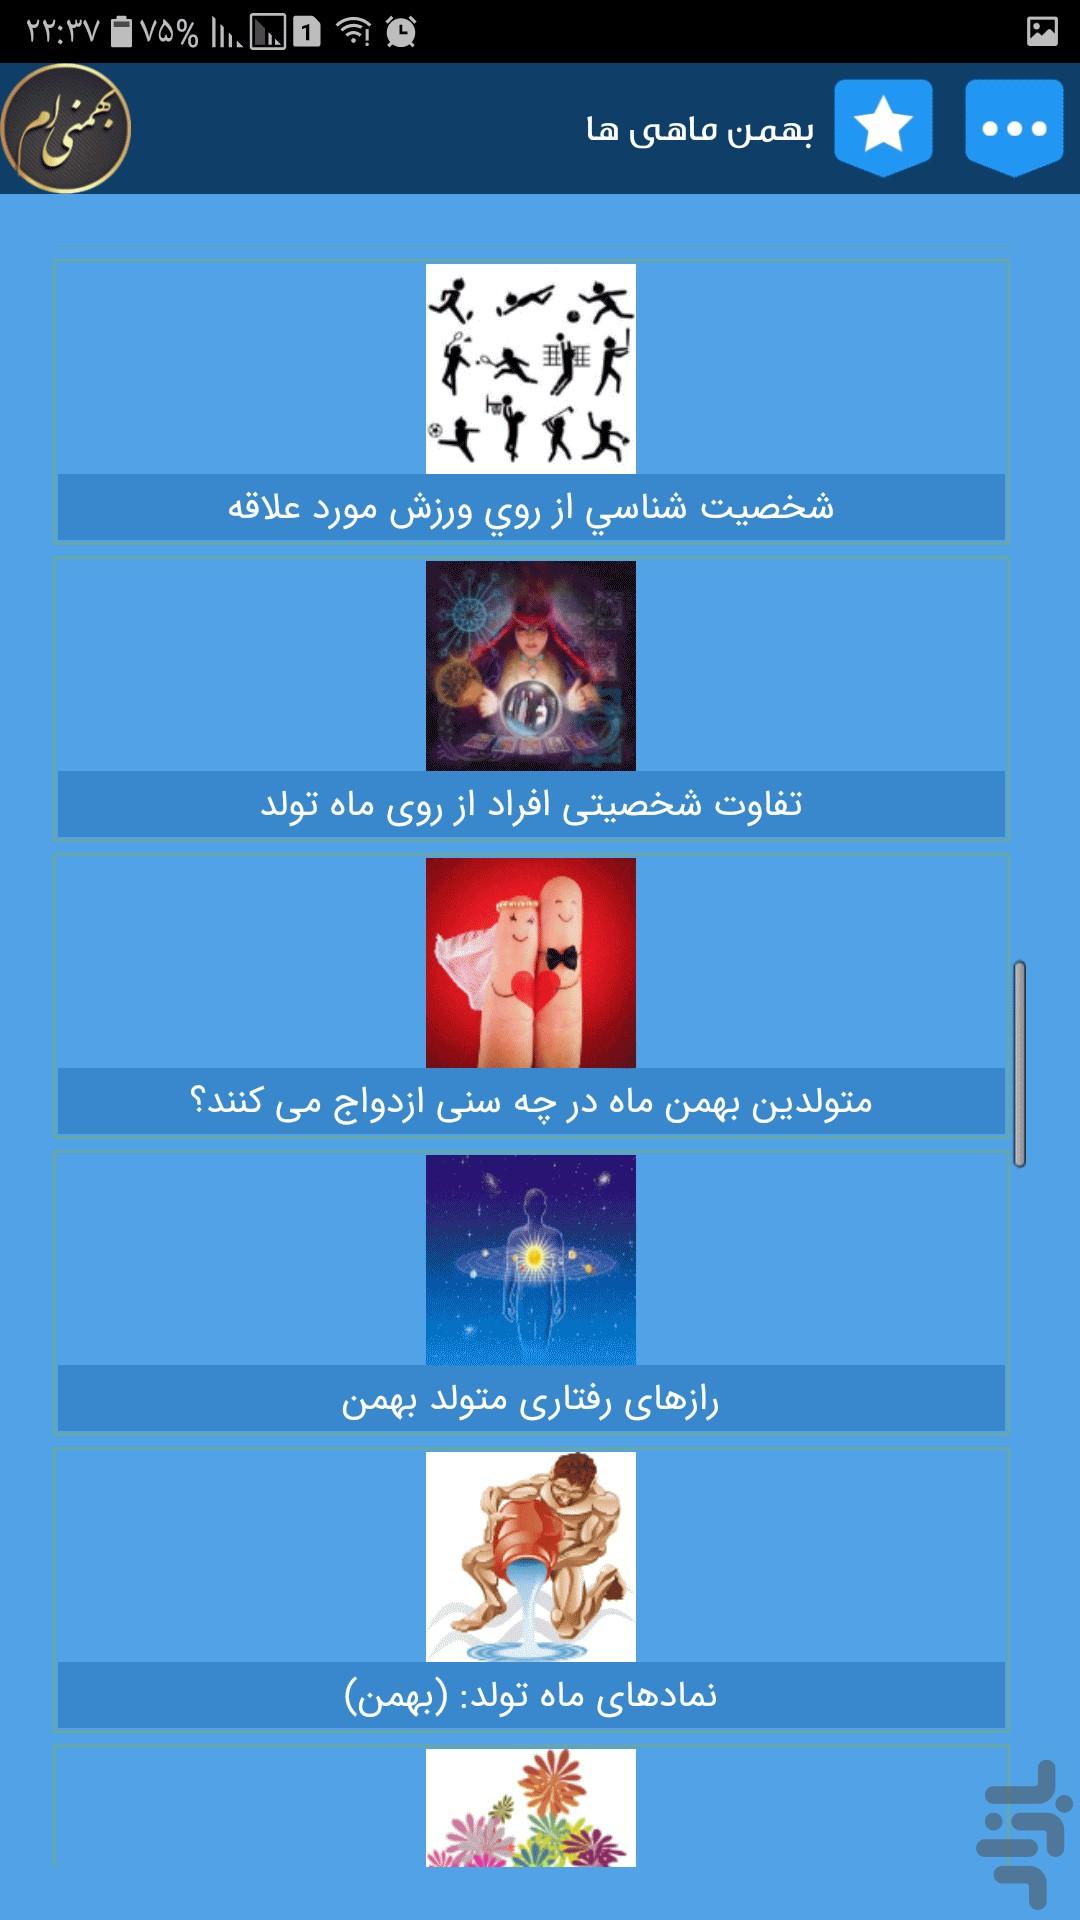 نوشته تولد بهمن ماه